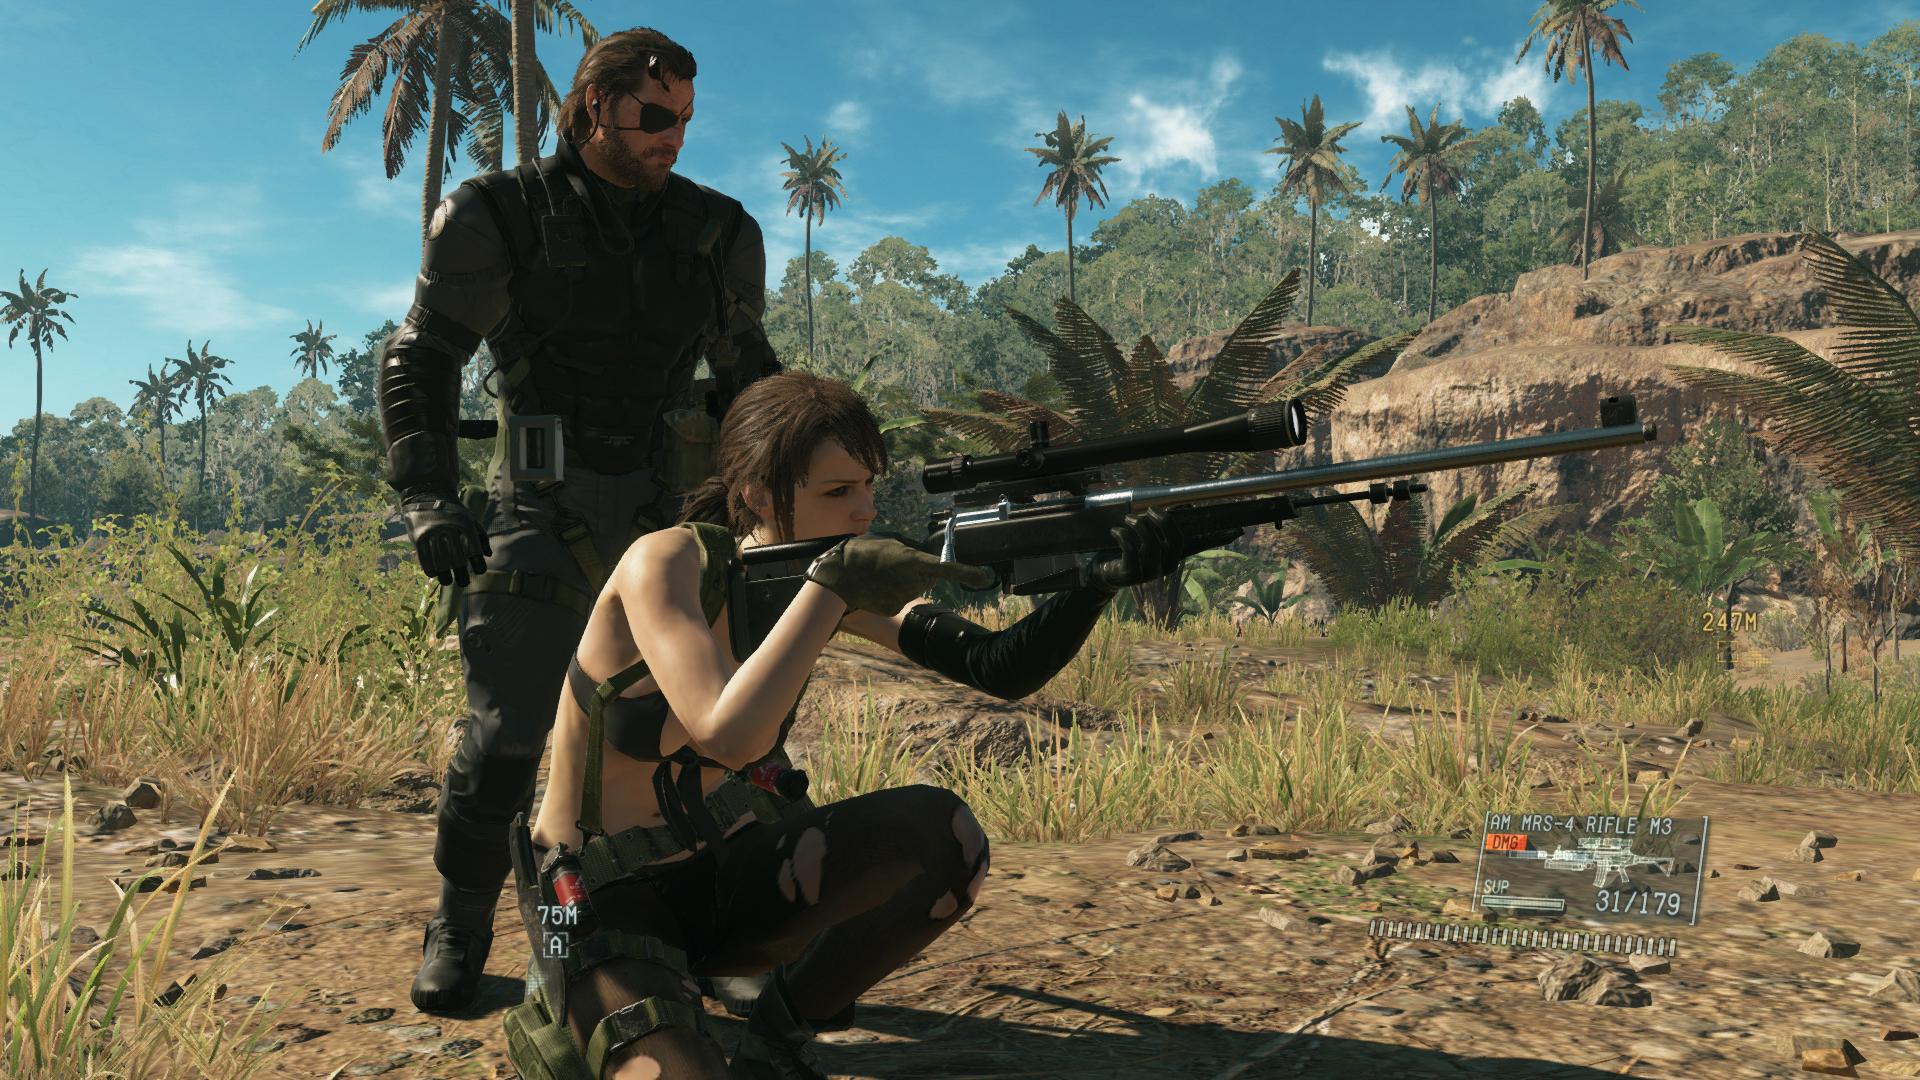 Metal Gear Solid V The Phantom Pain ESPAÑOL Descargar Full (CPY) + REPACK 5 DVD5 (JPW) 1